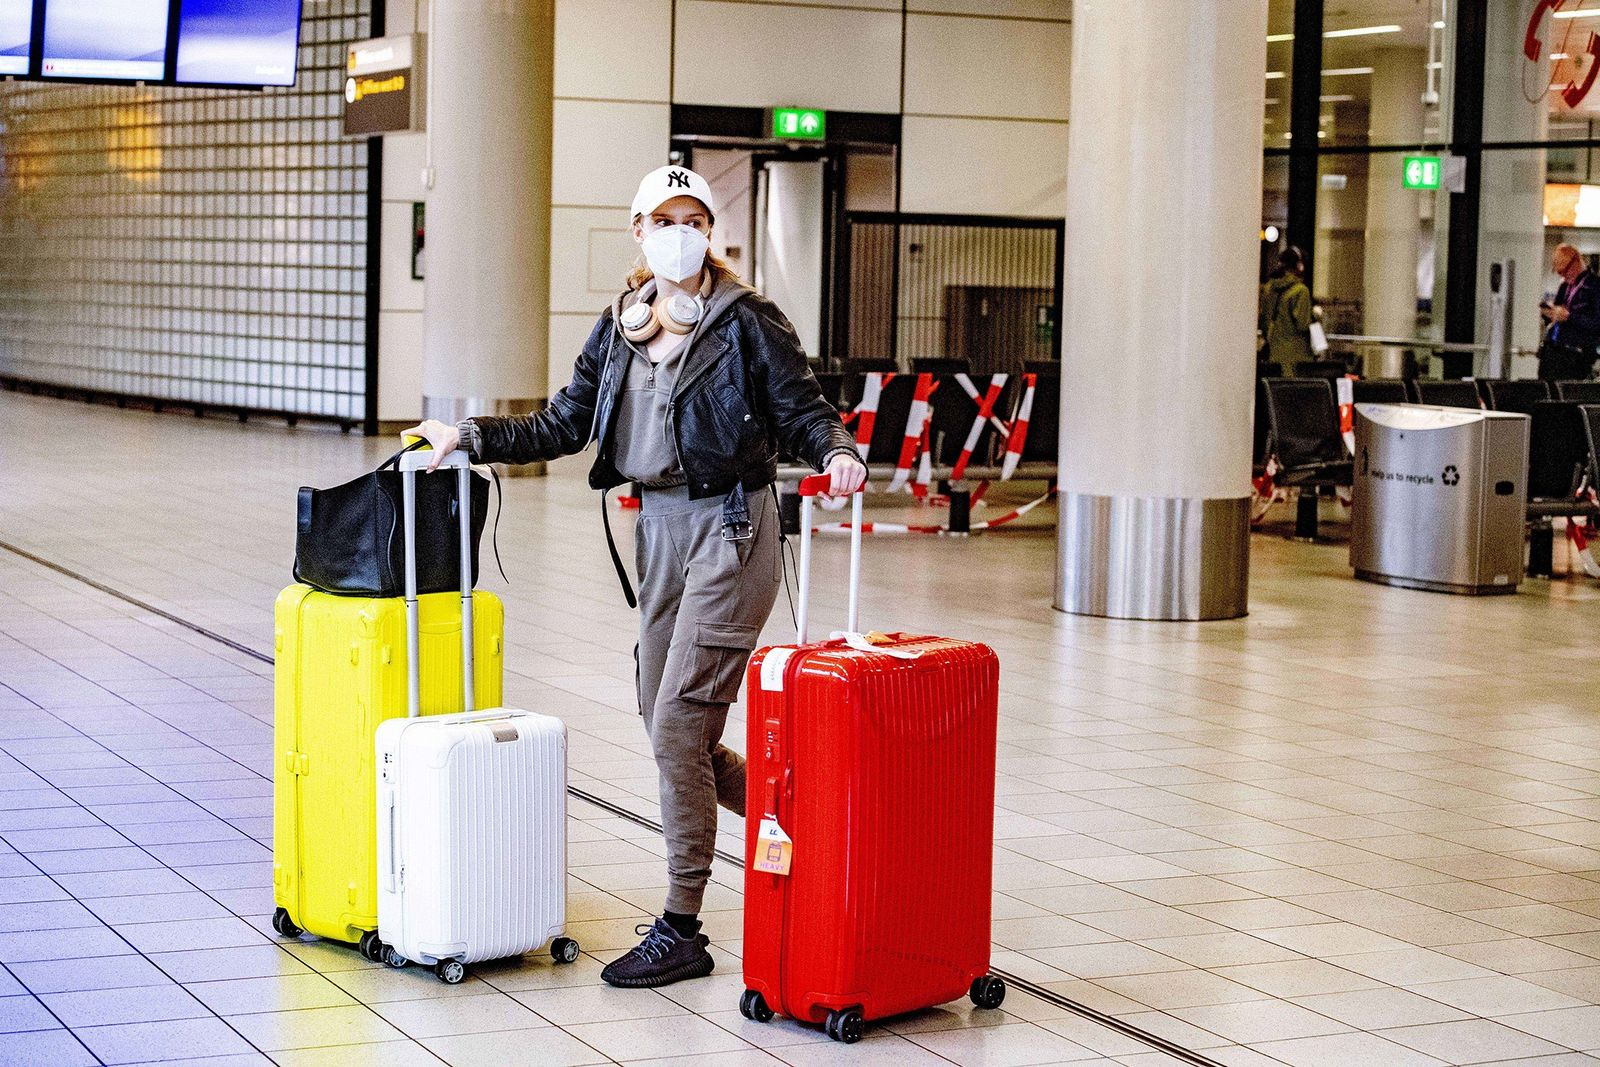 Aeropuerto Schiphol de Ámsterdam